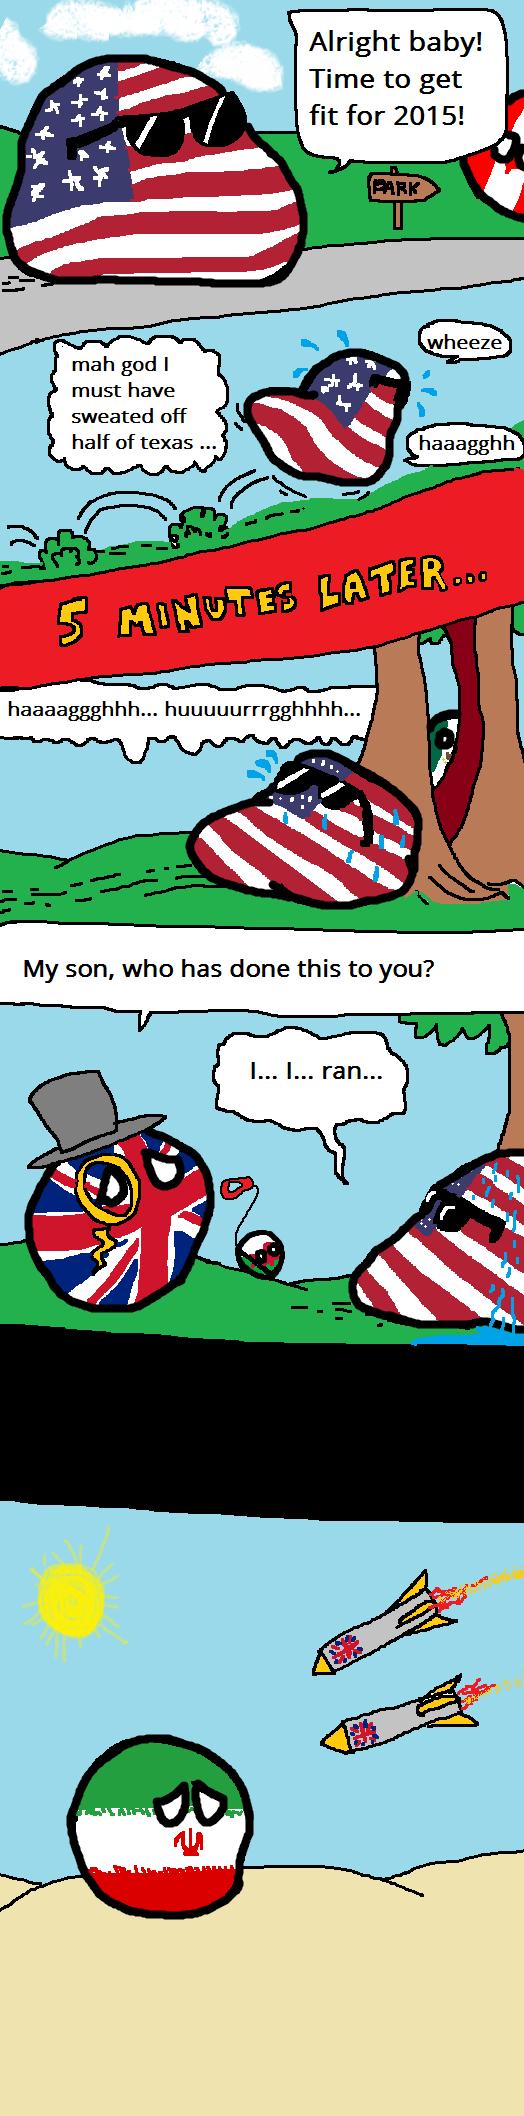 polandball Funny comics, Funny memes, Funny